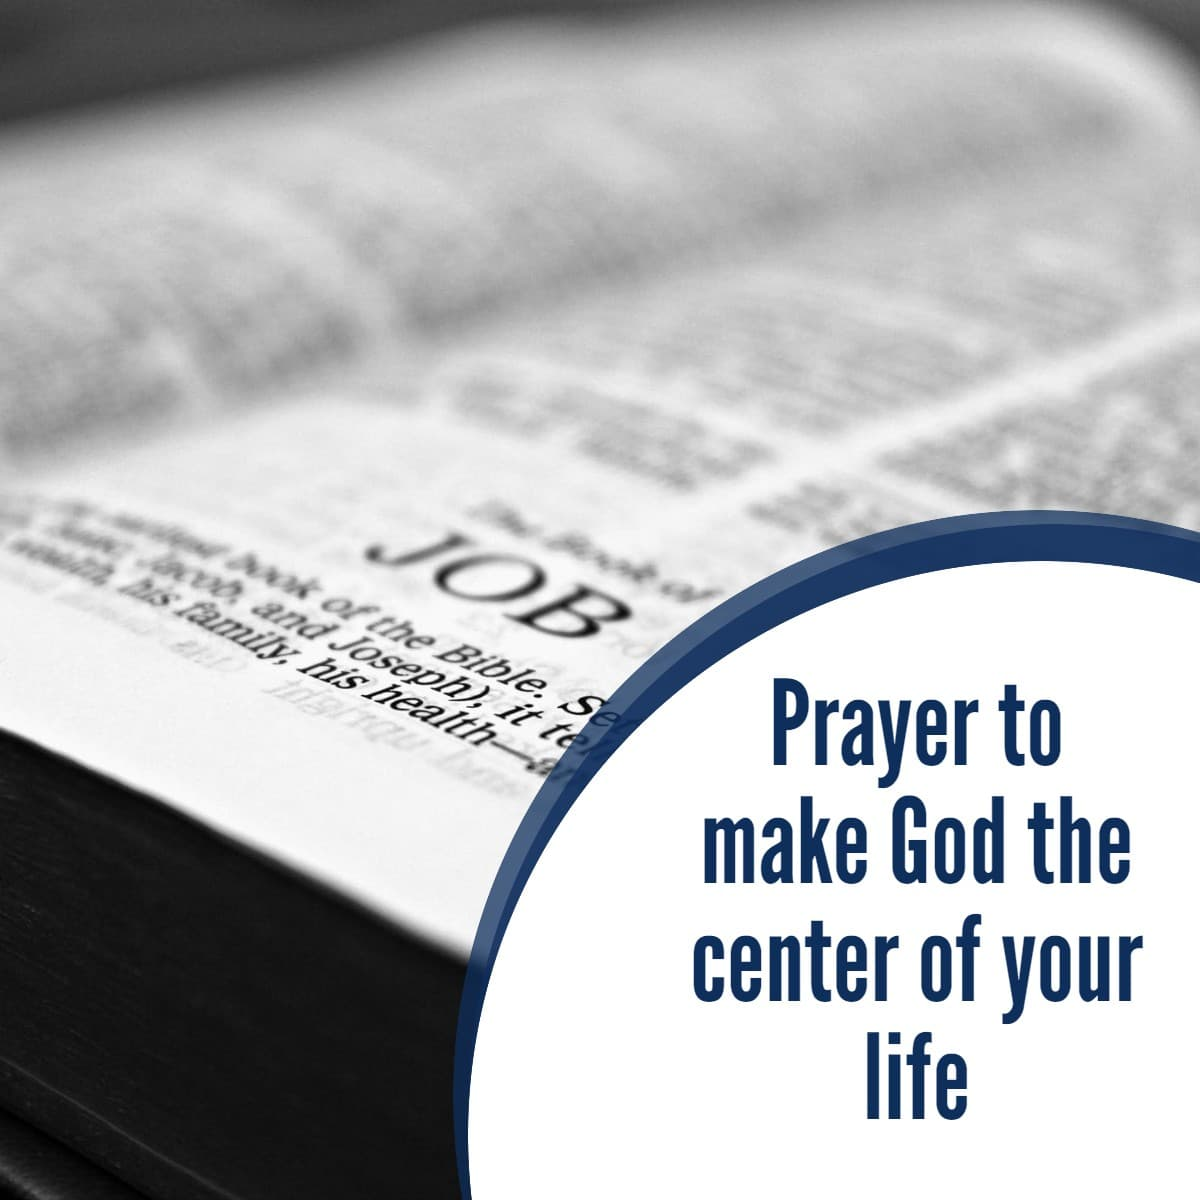 Prayer to make God the center of your life